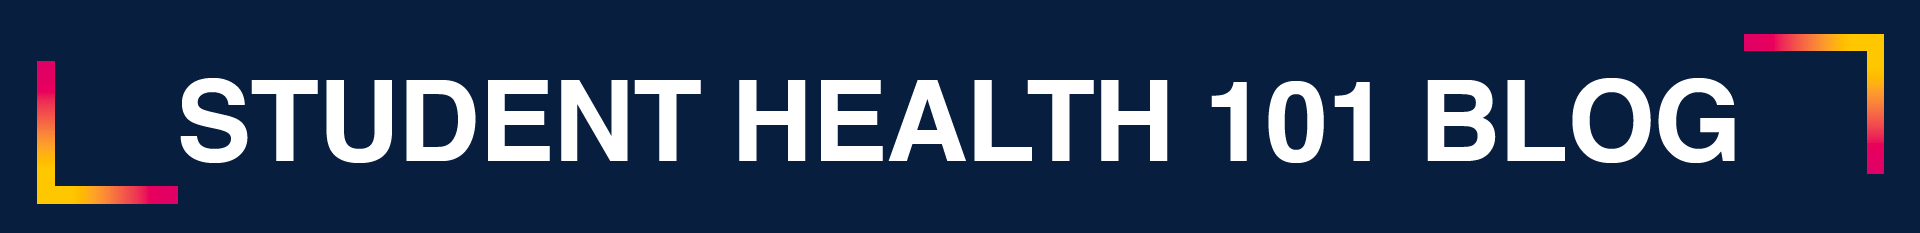 Student Health 101 Blog